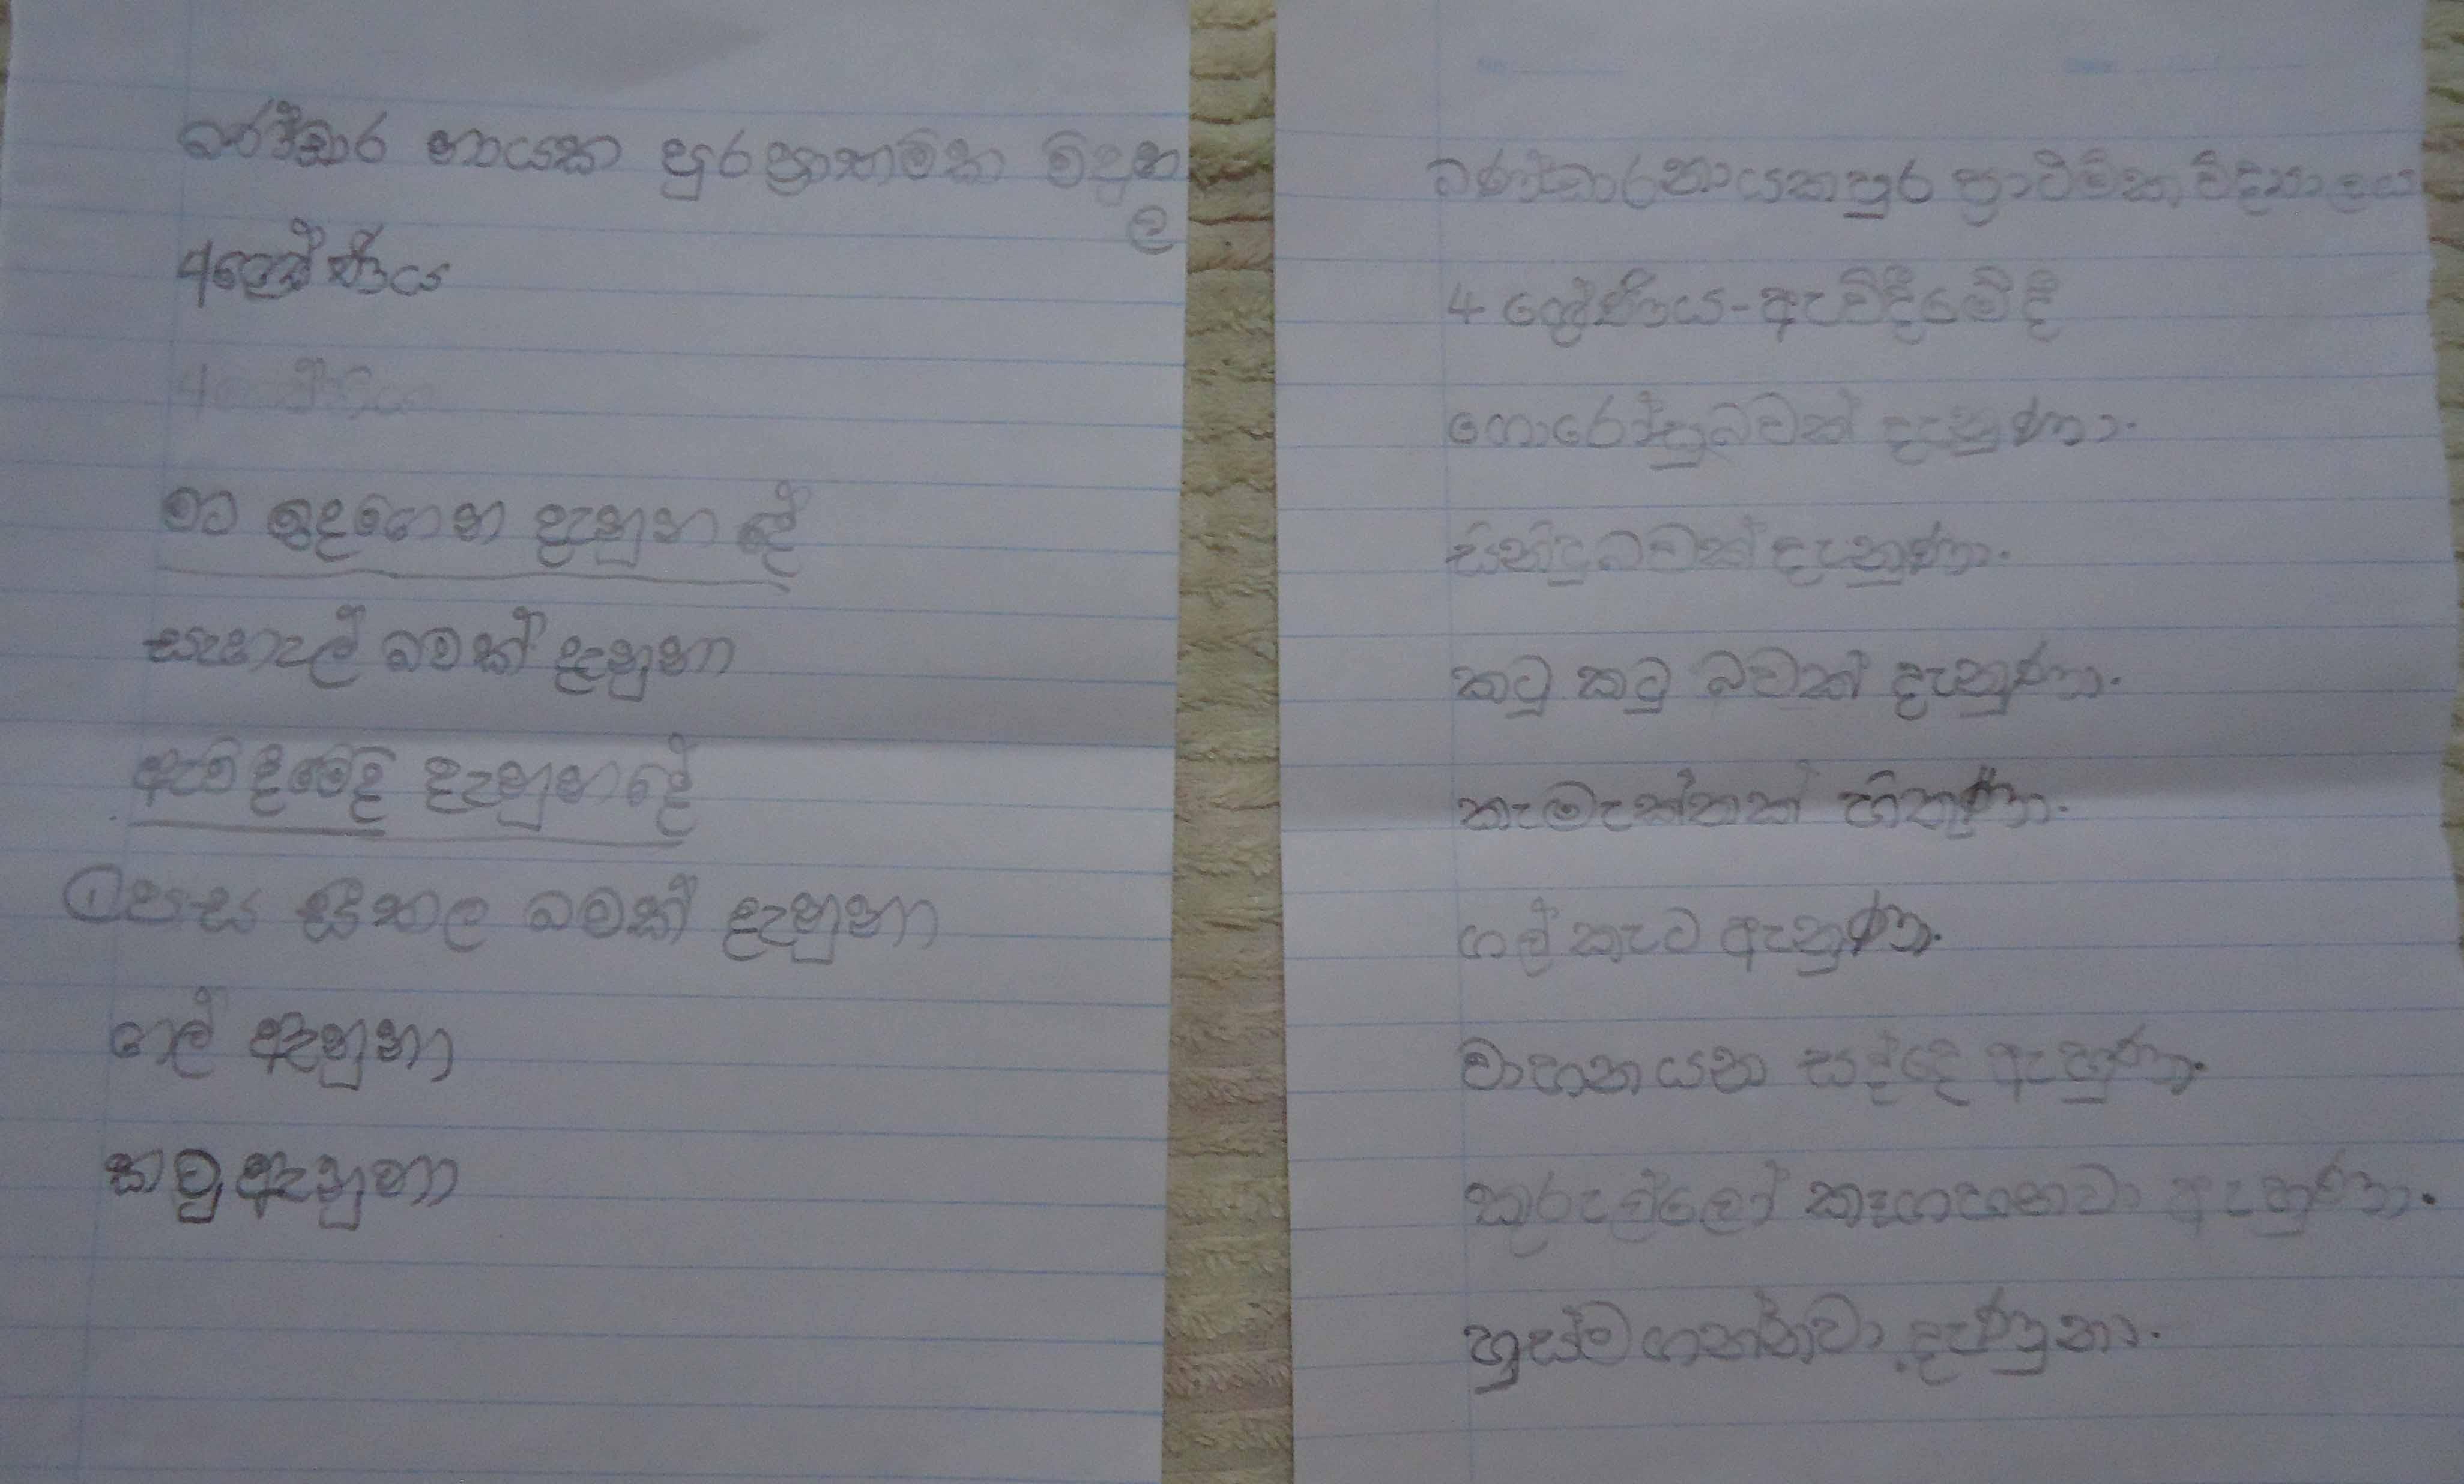 Feedback from students-WP GM Bandaranayakepura Primary School, Kirindiwela (2)